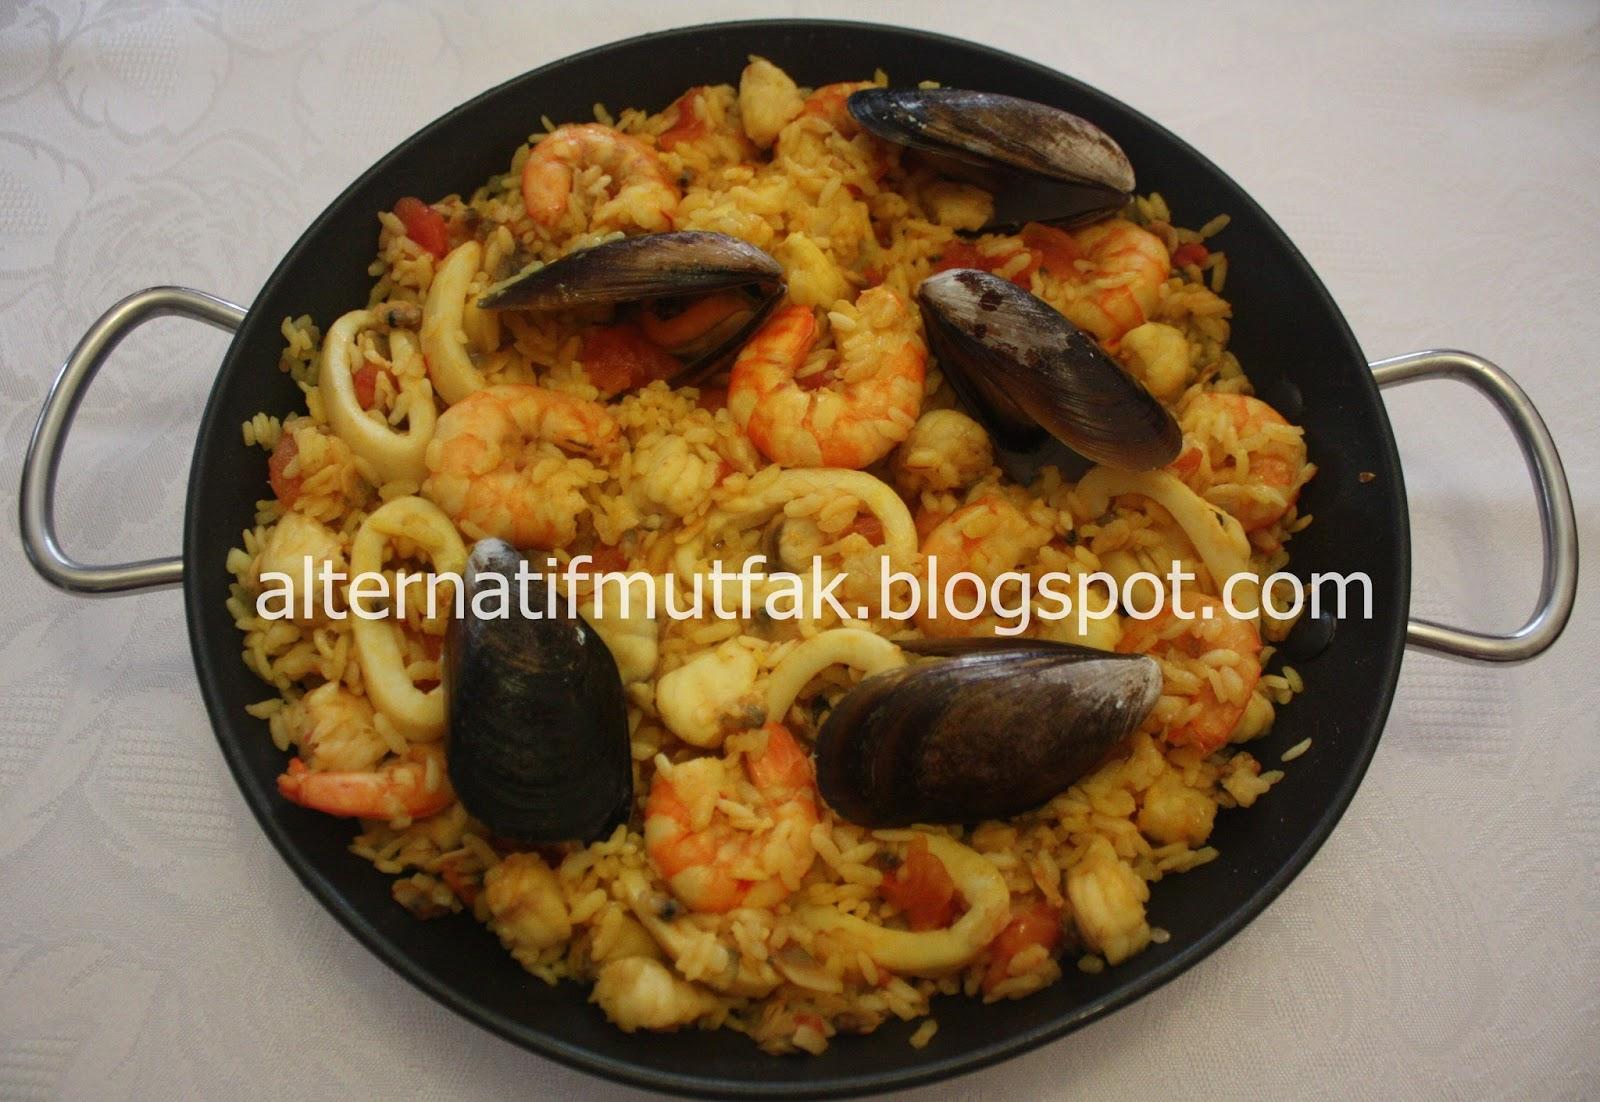 Safranlı Paella tarifi